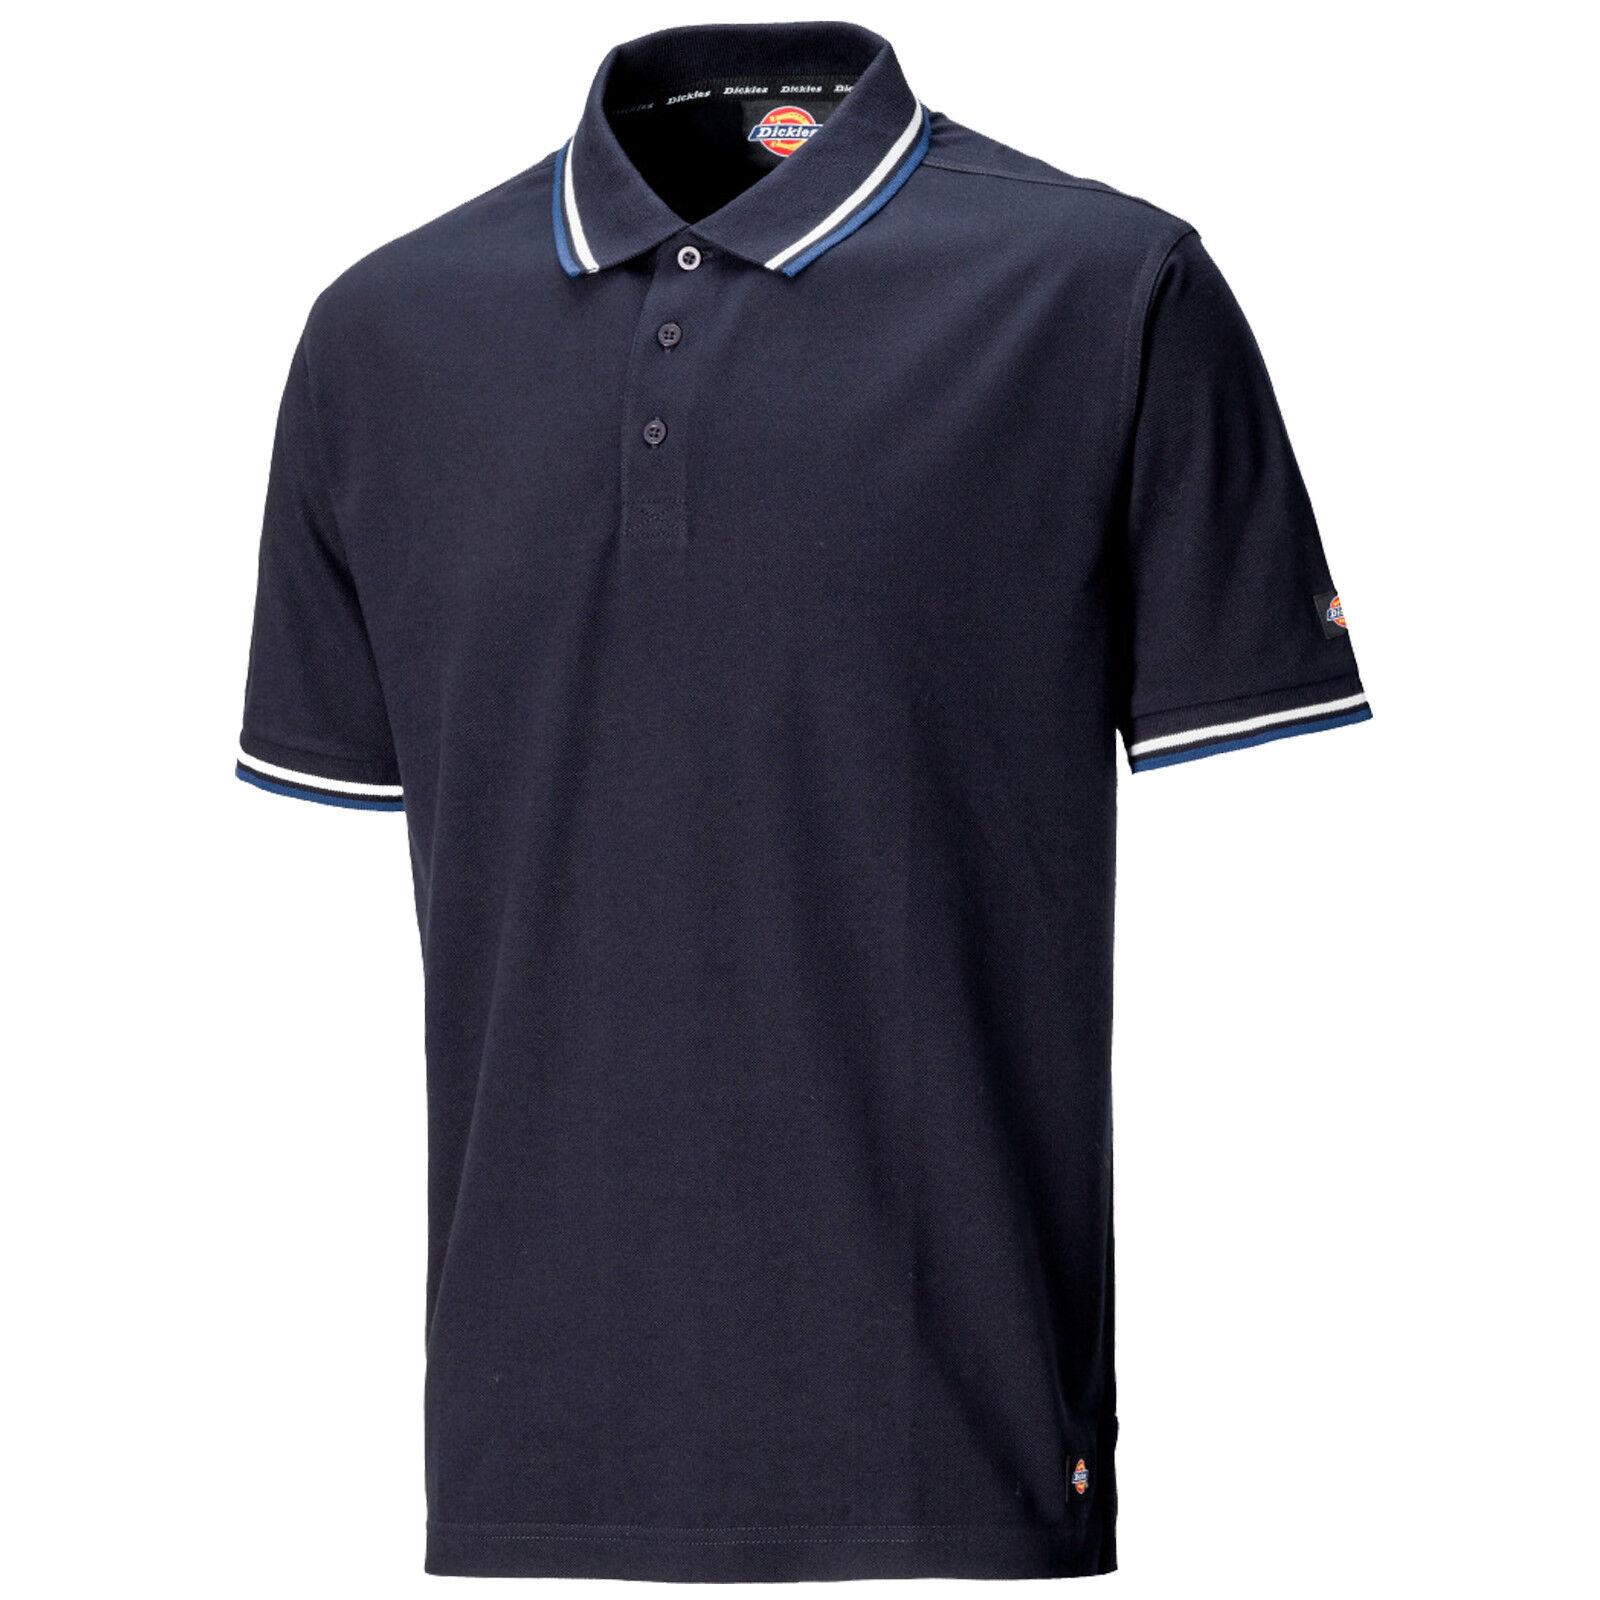 SH2001 Navy Black Grey Dickies Riverton Polo Shirt